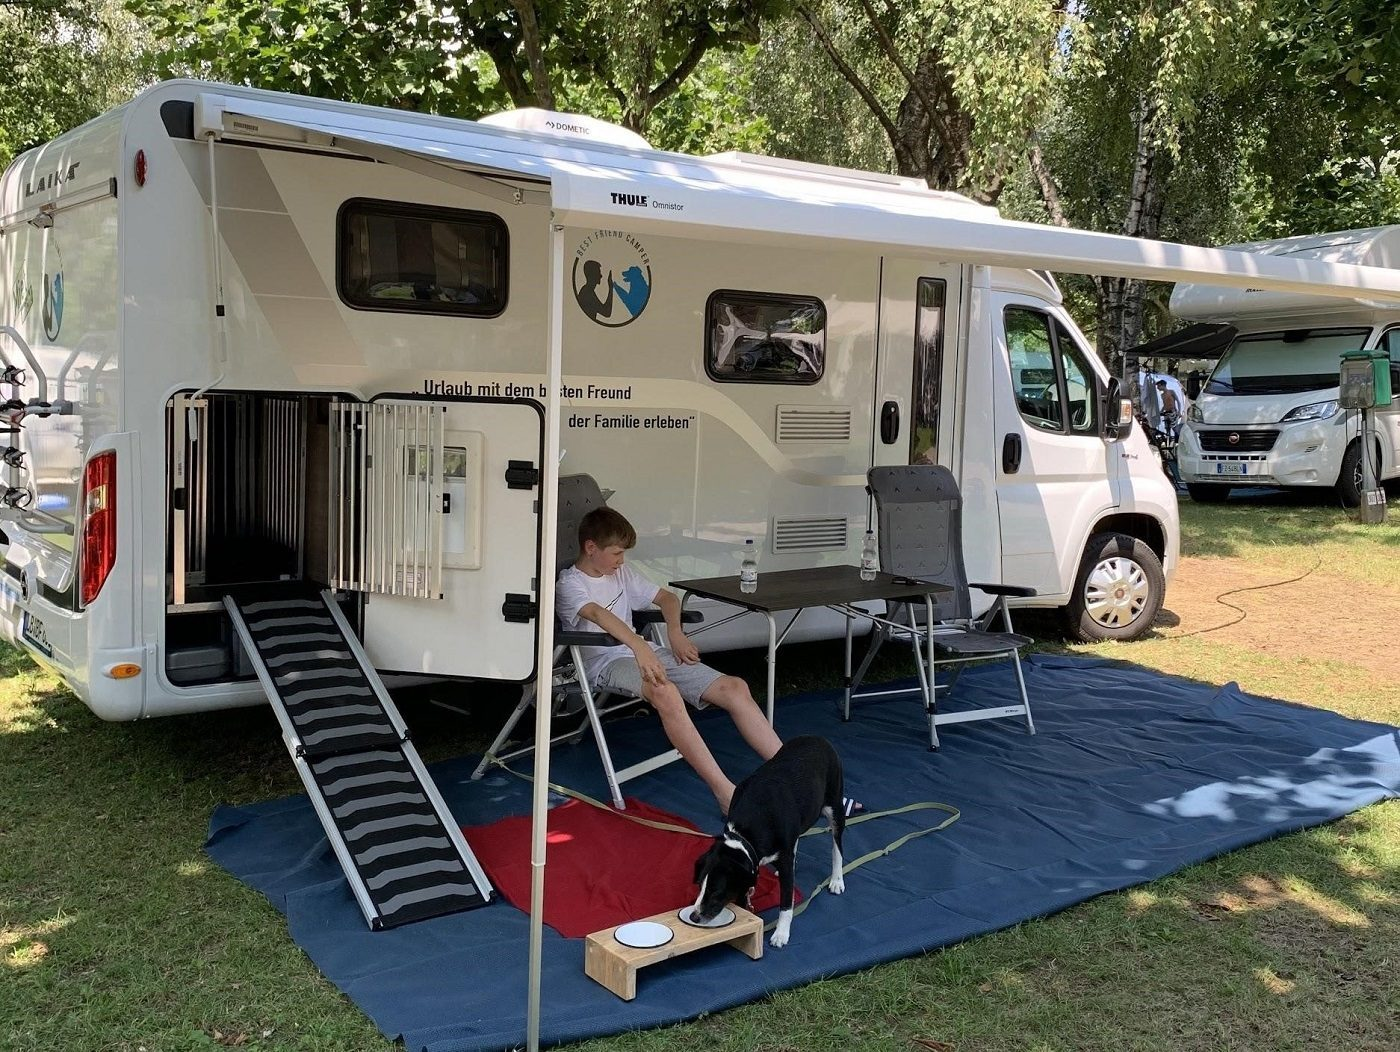 vater sohn hund camper